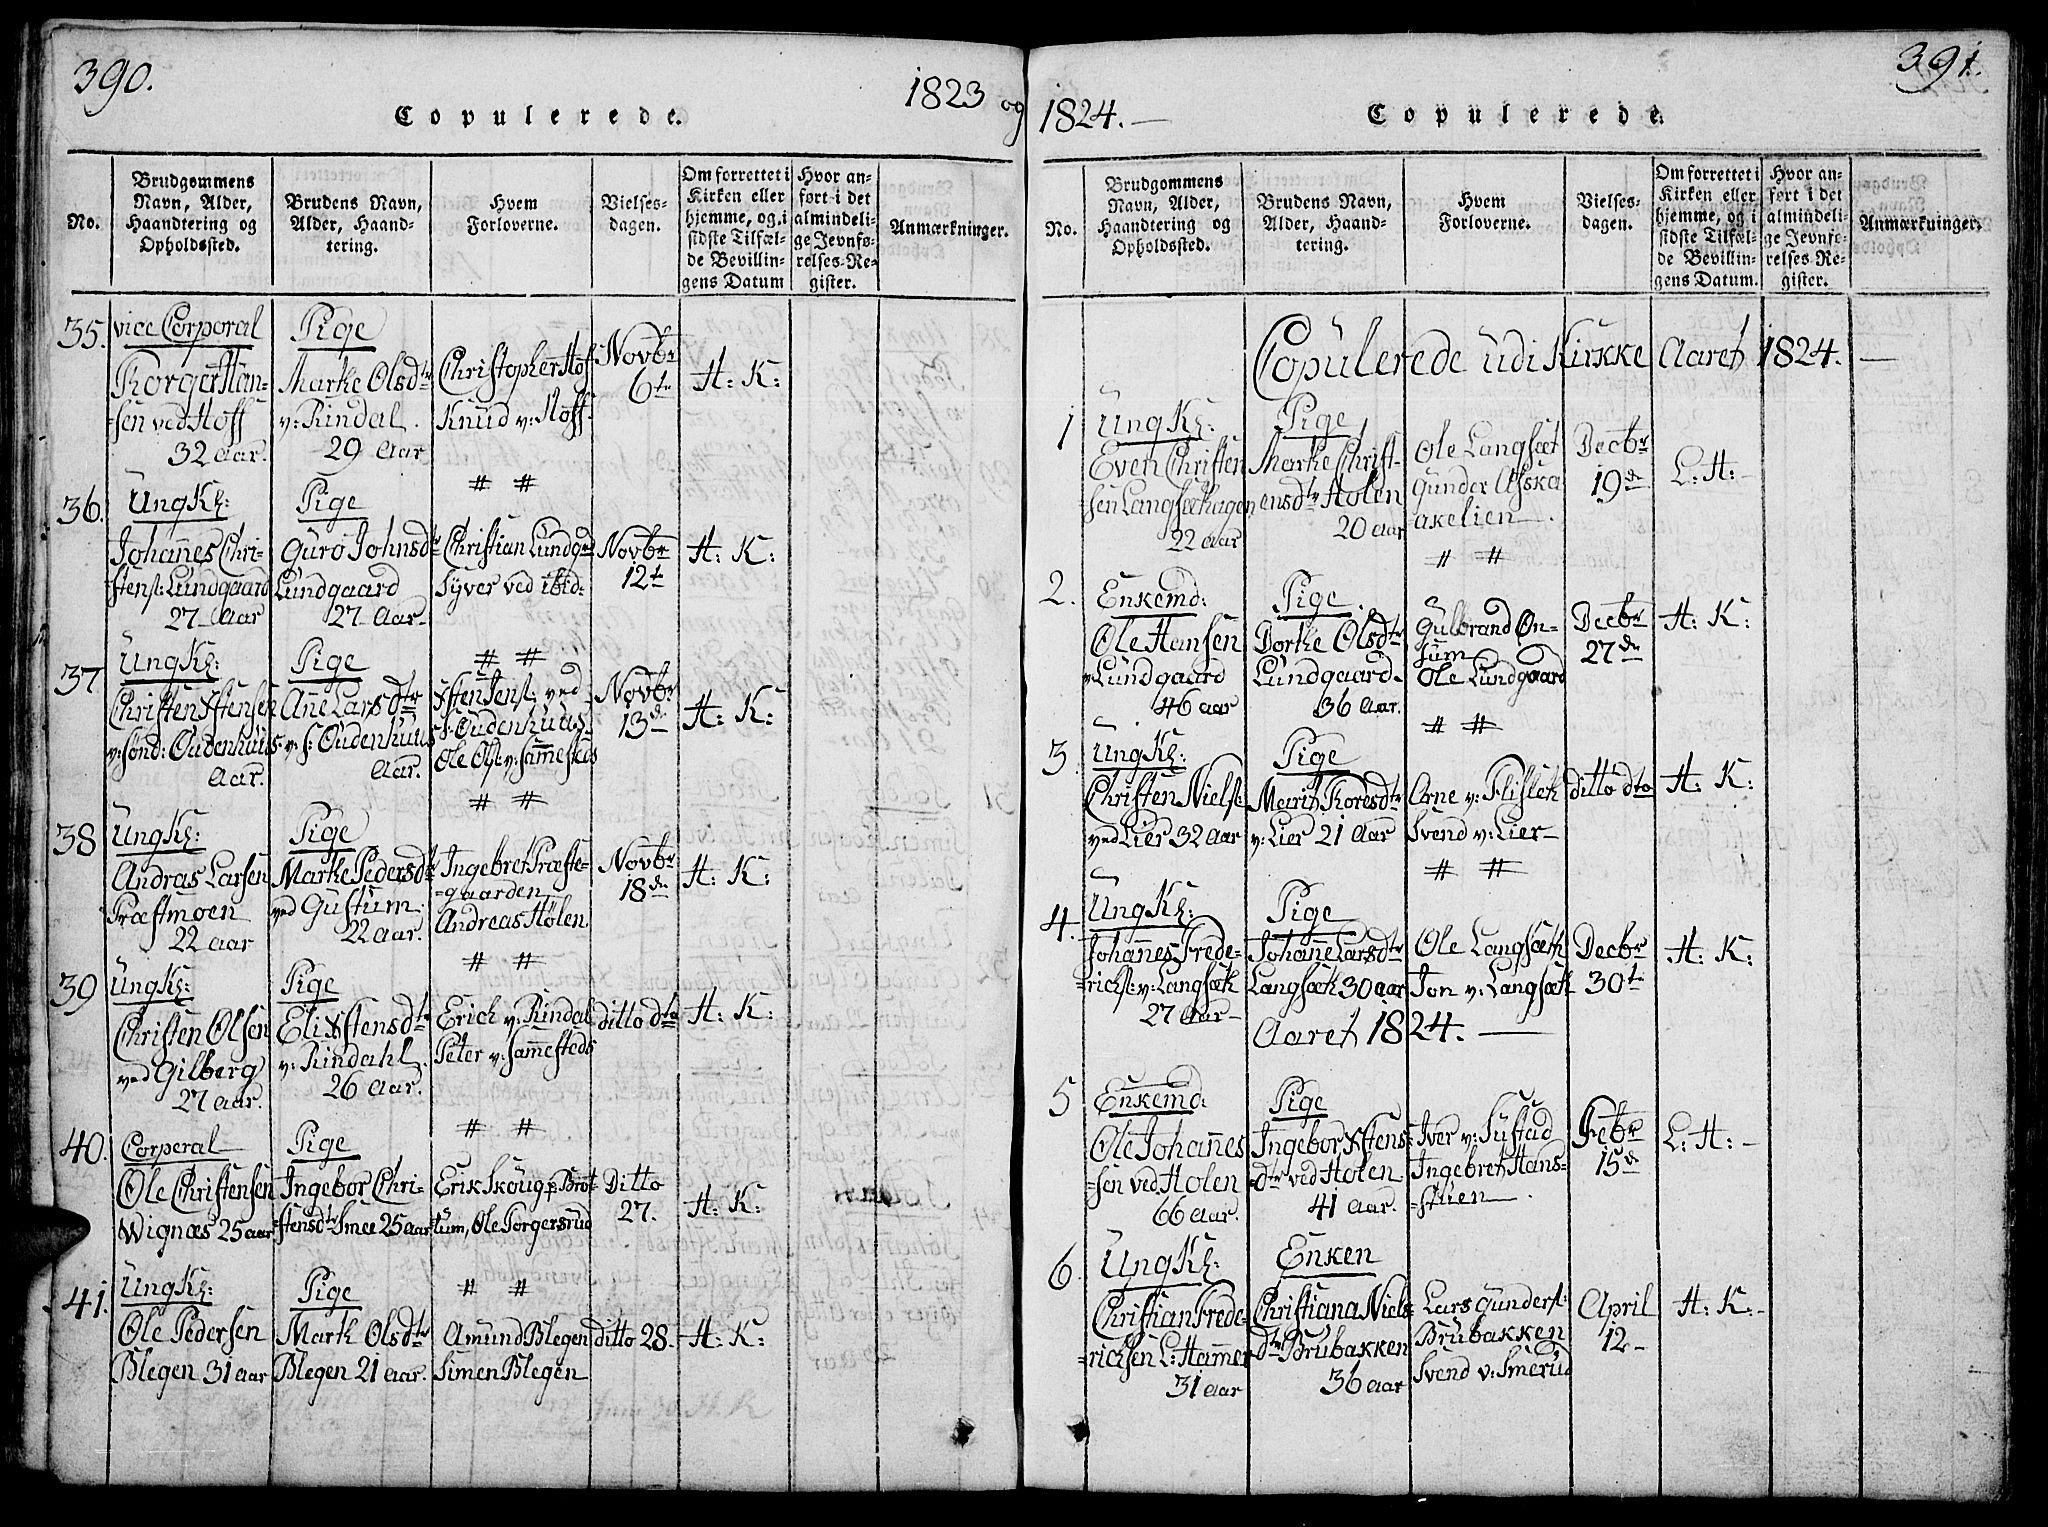 SAH, Fåberg prestekontor, Klokkerbok nr. 4, 1818-1837, s. 390-391